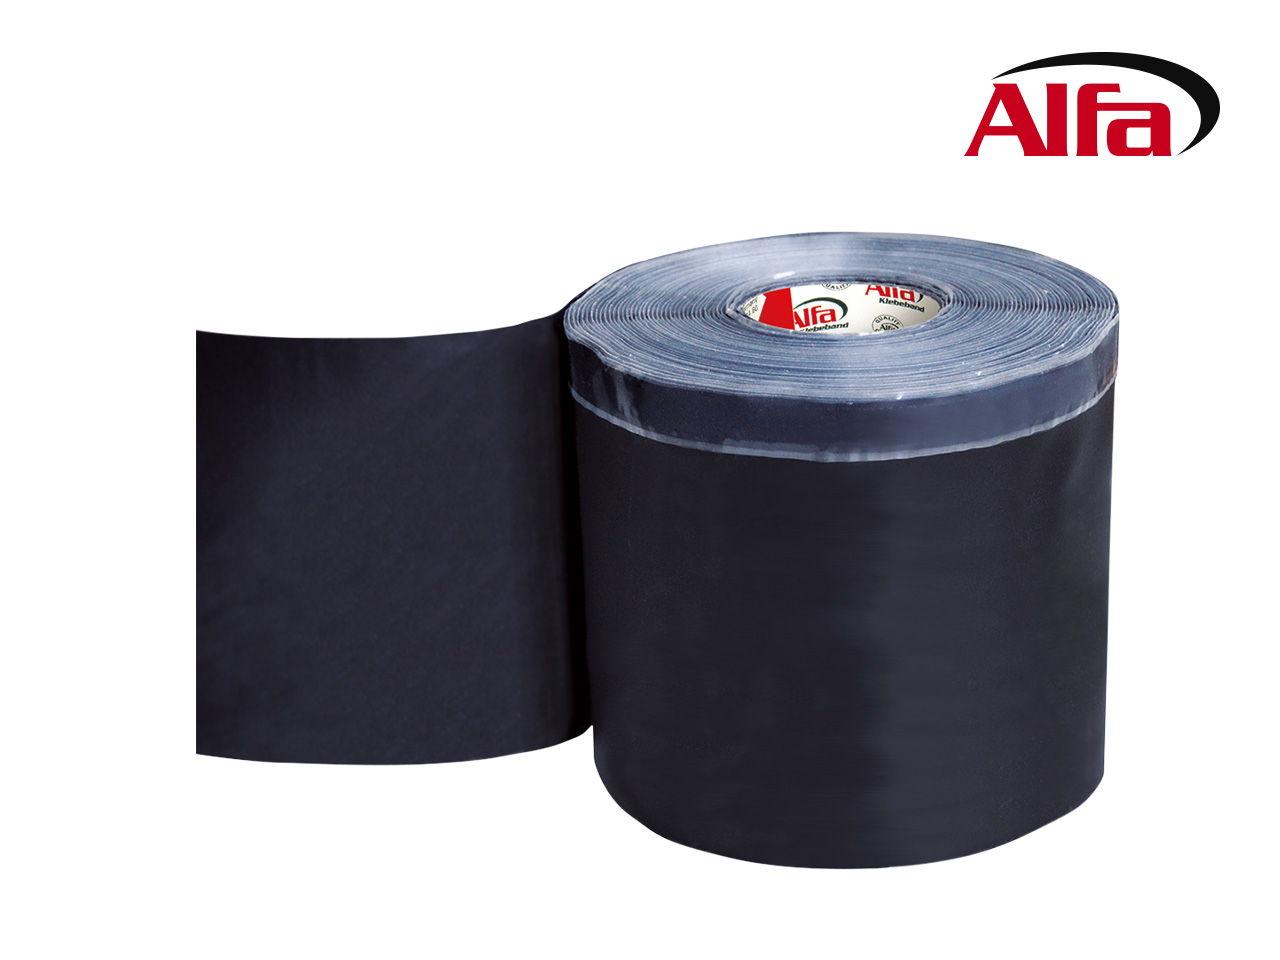 alfa epdm folie aus epdm kautschuk butyl selbstklebestreifen. Black Bedroom Furniture Sets. Home Design Ideas